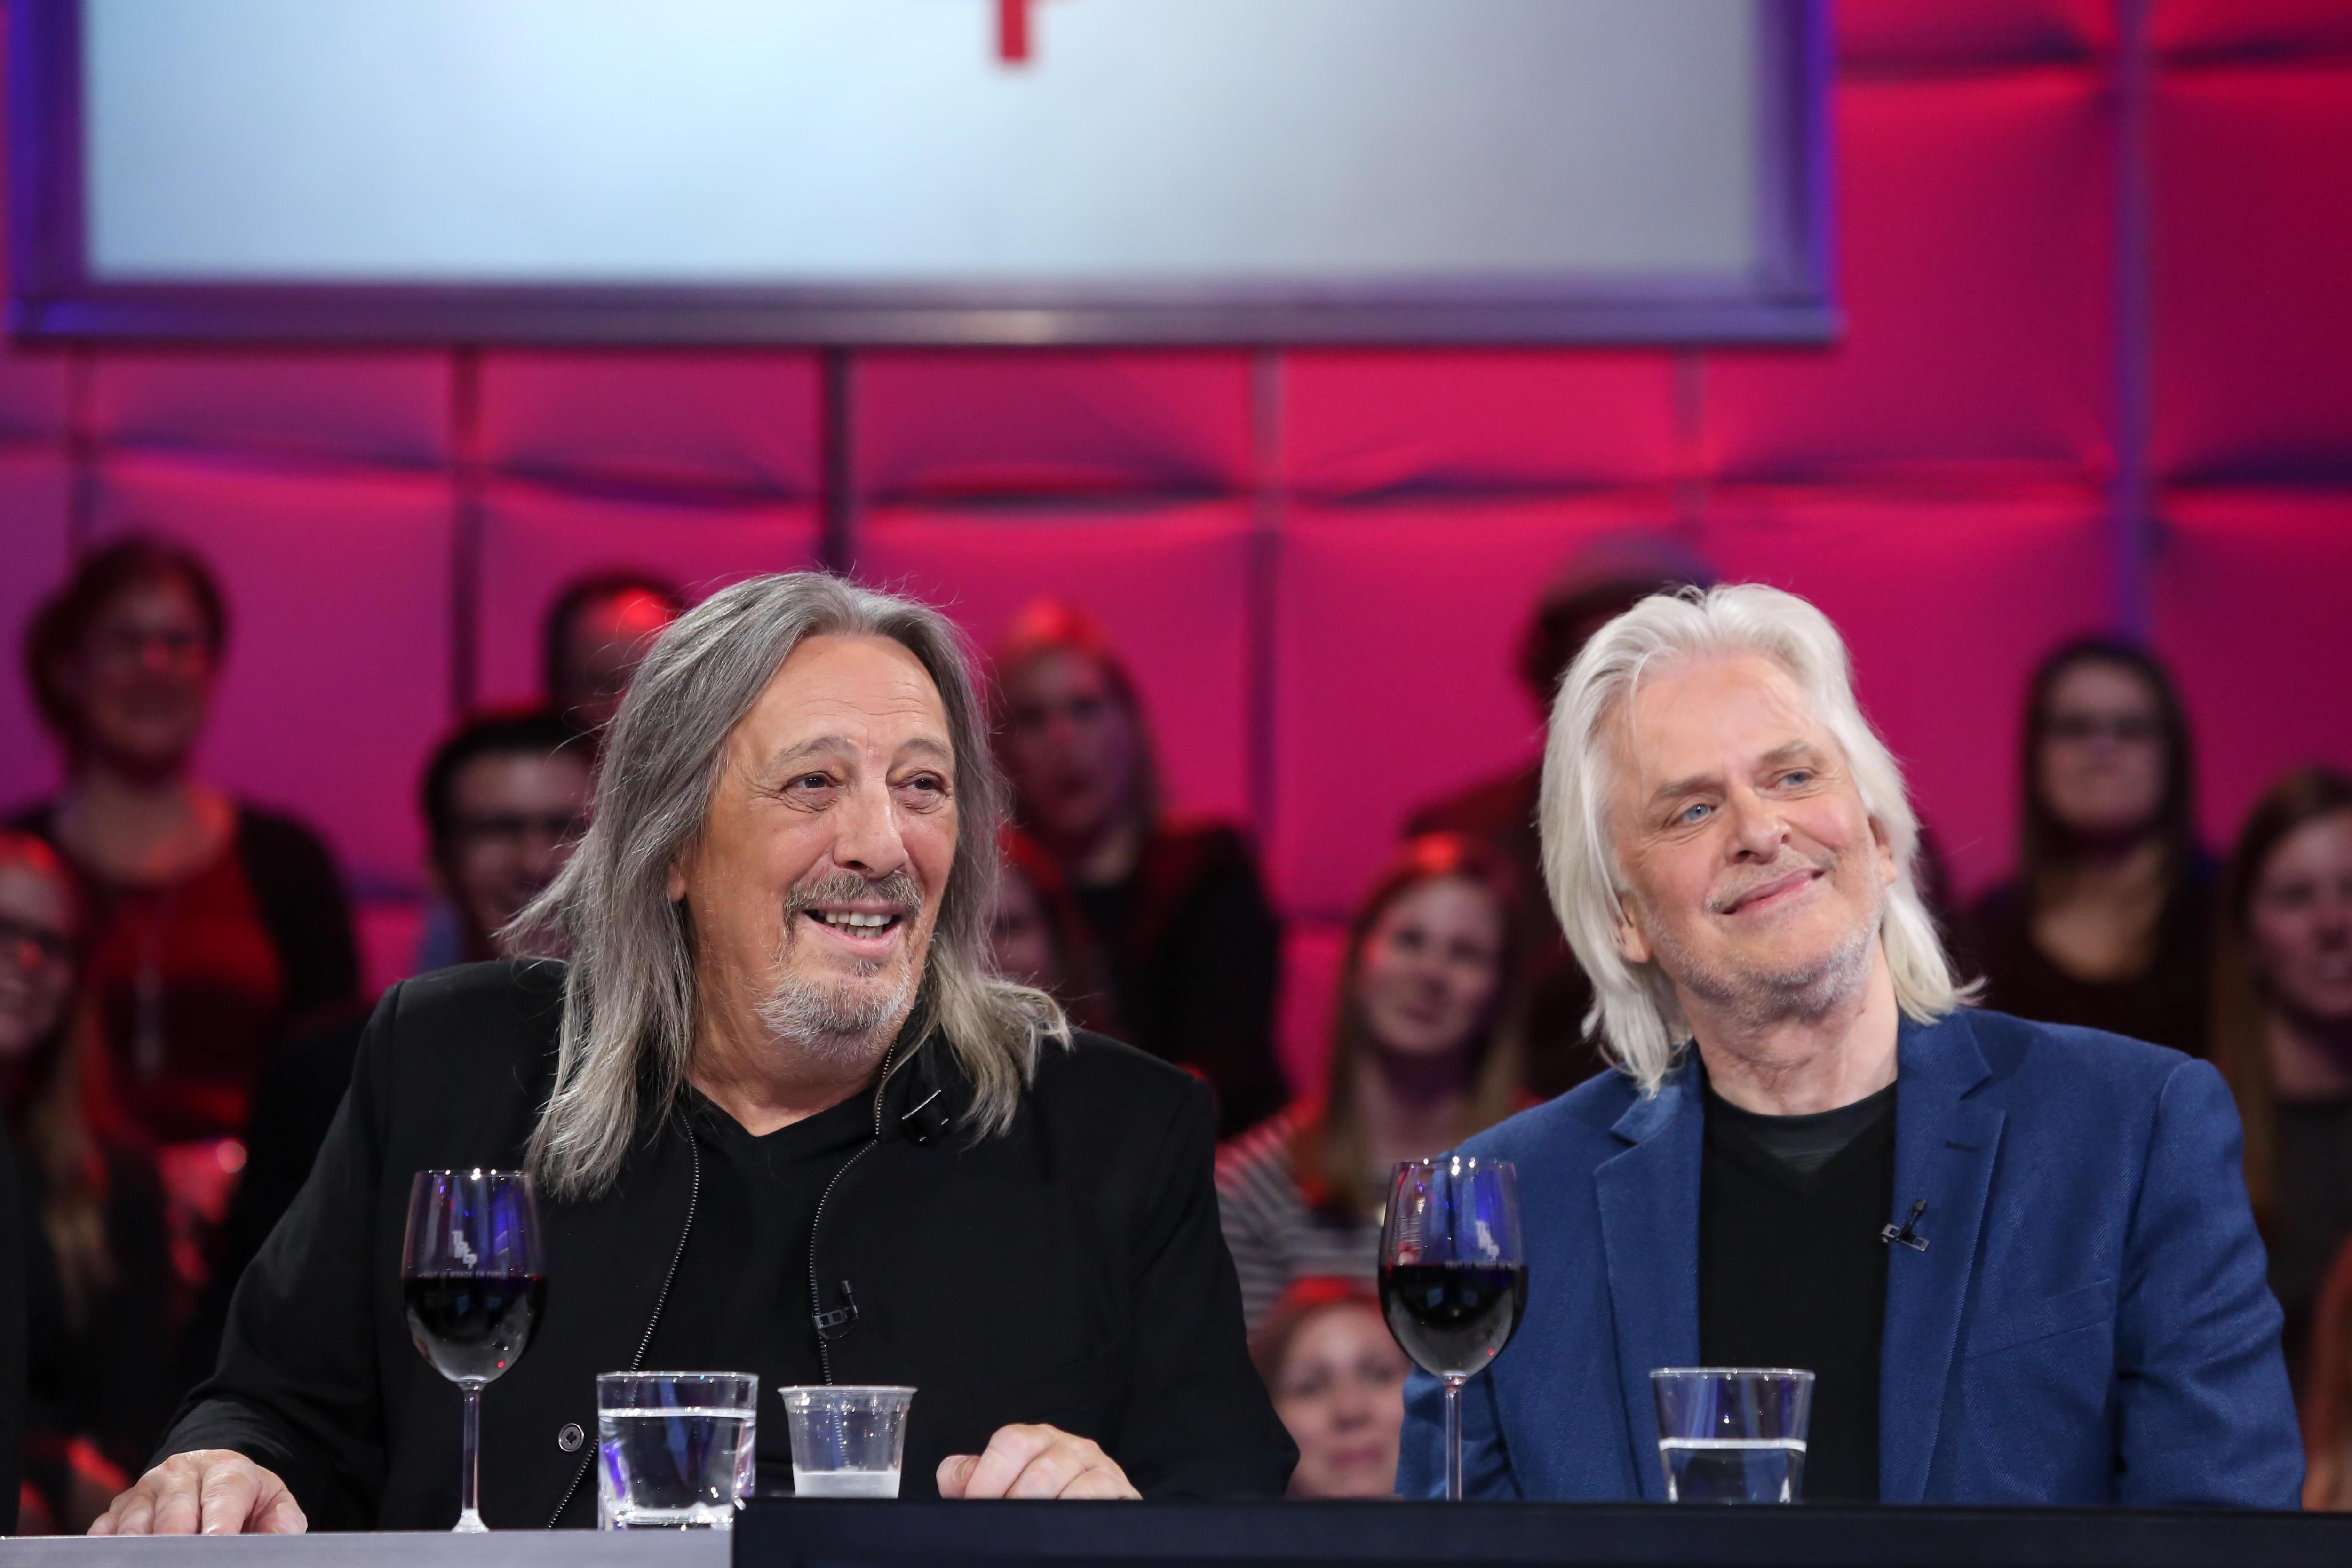 Serge Fiori et Louis Valois, souriants